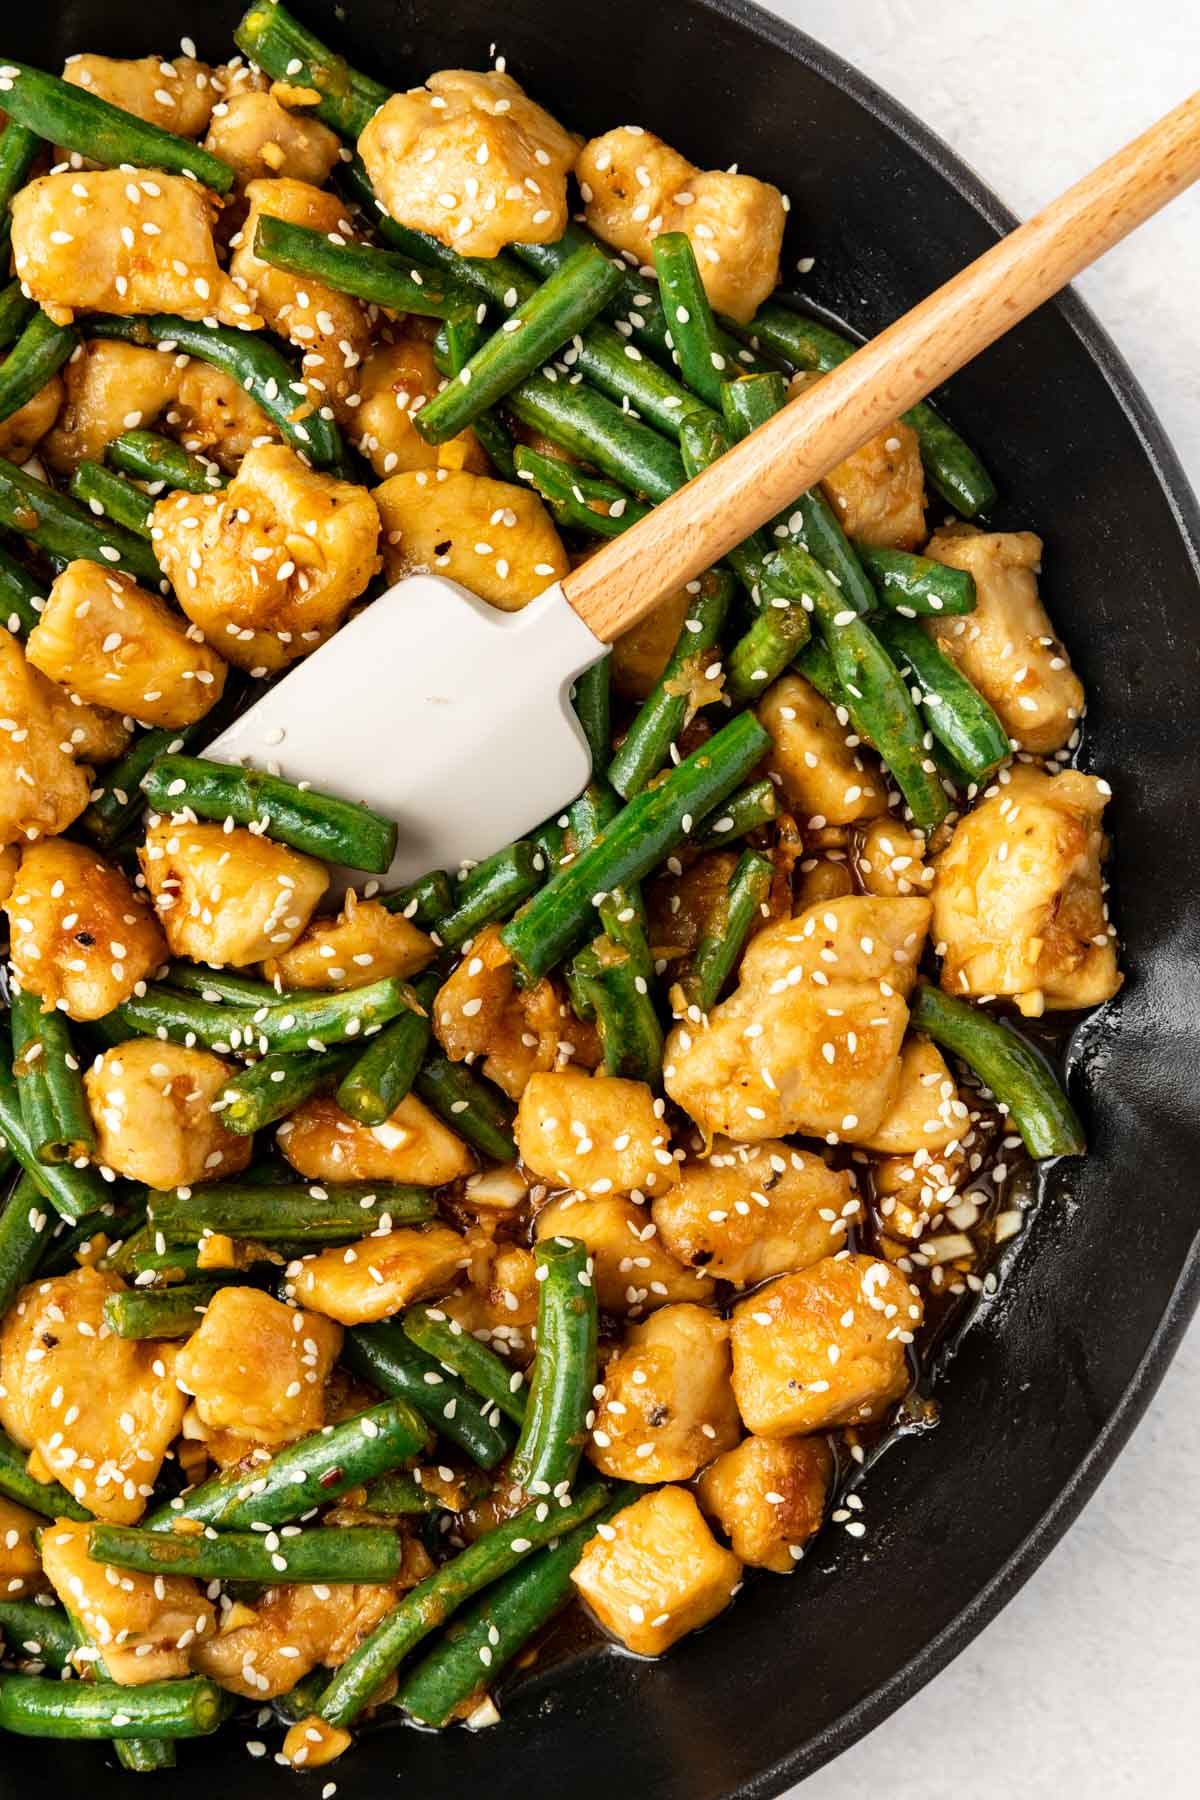 Healthy Lemon Chicken Stir Fry in the pan